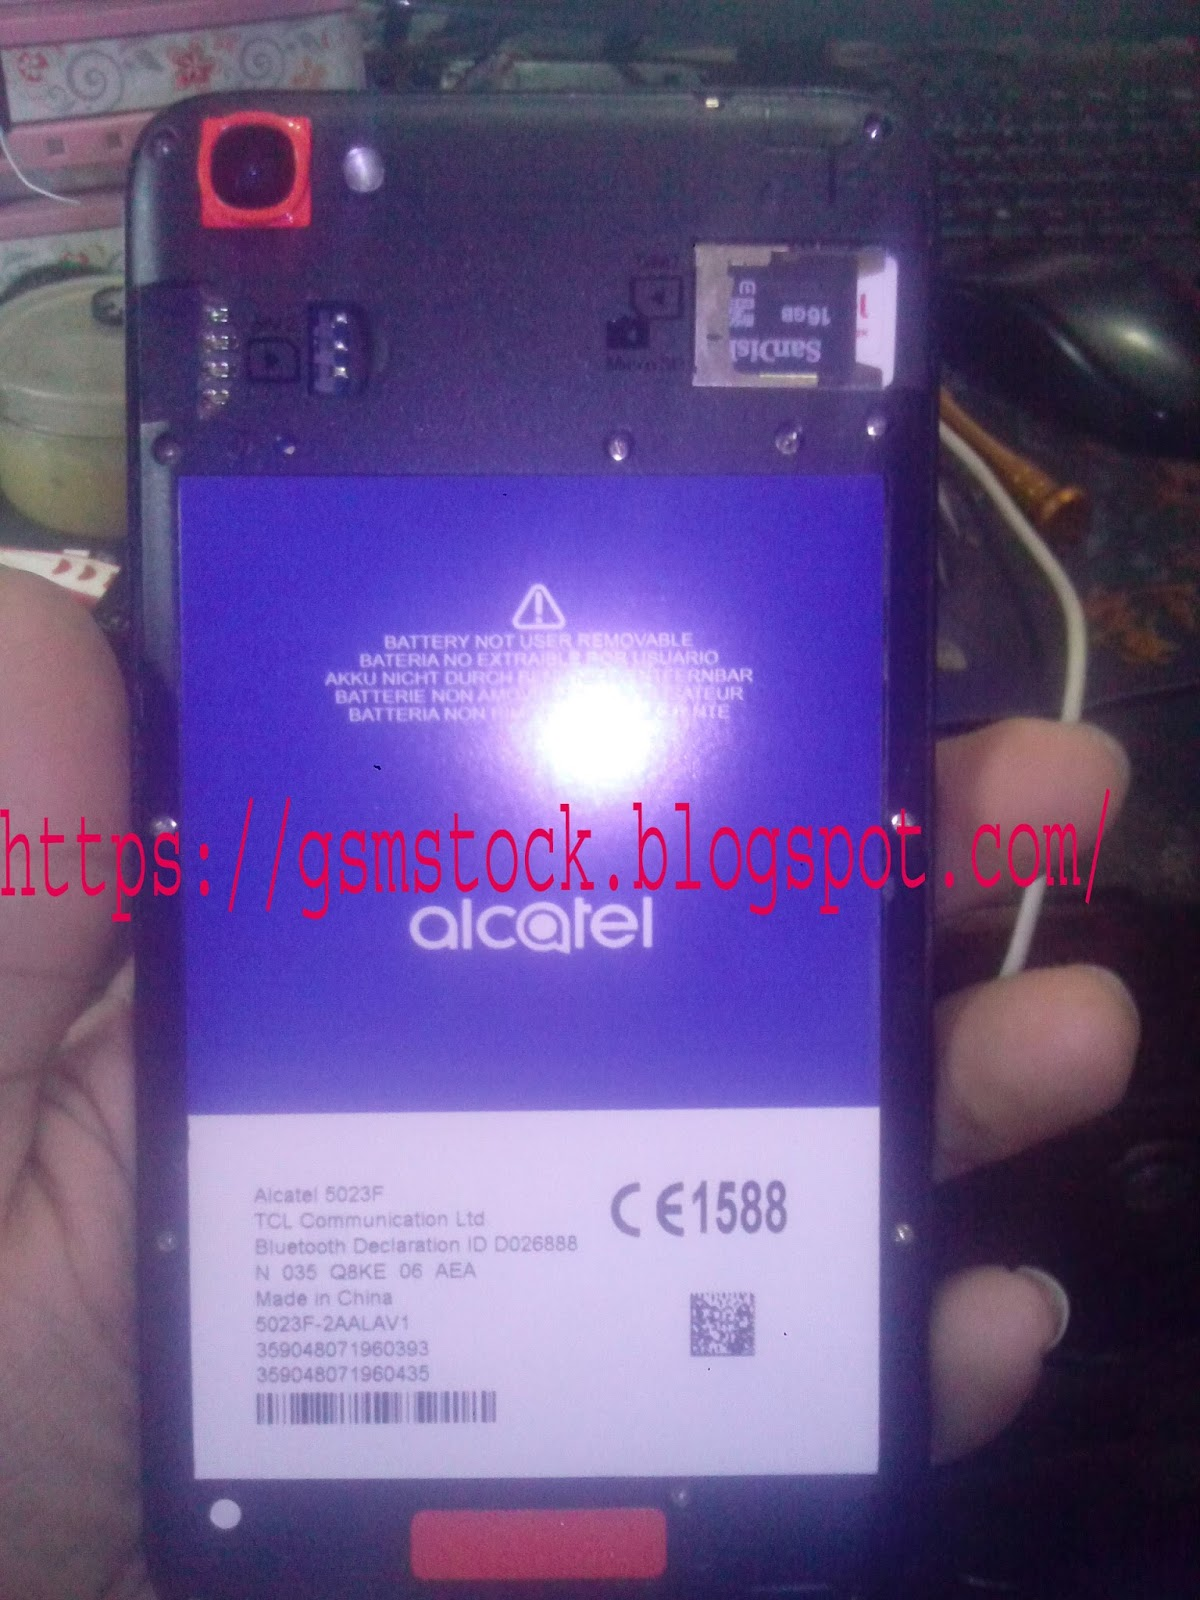 Firmware Flash File: Alcatel TCL 5023F-MT6580 6 0 Firmware